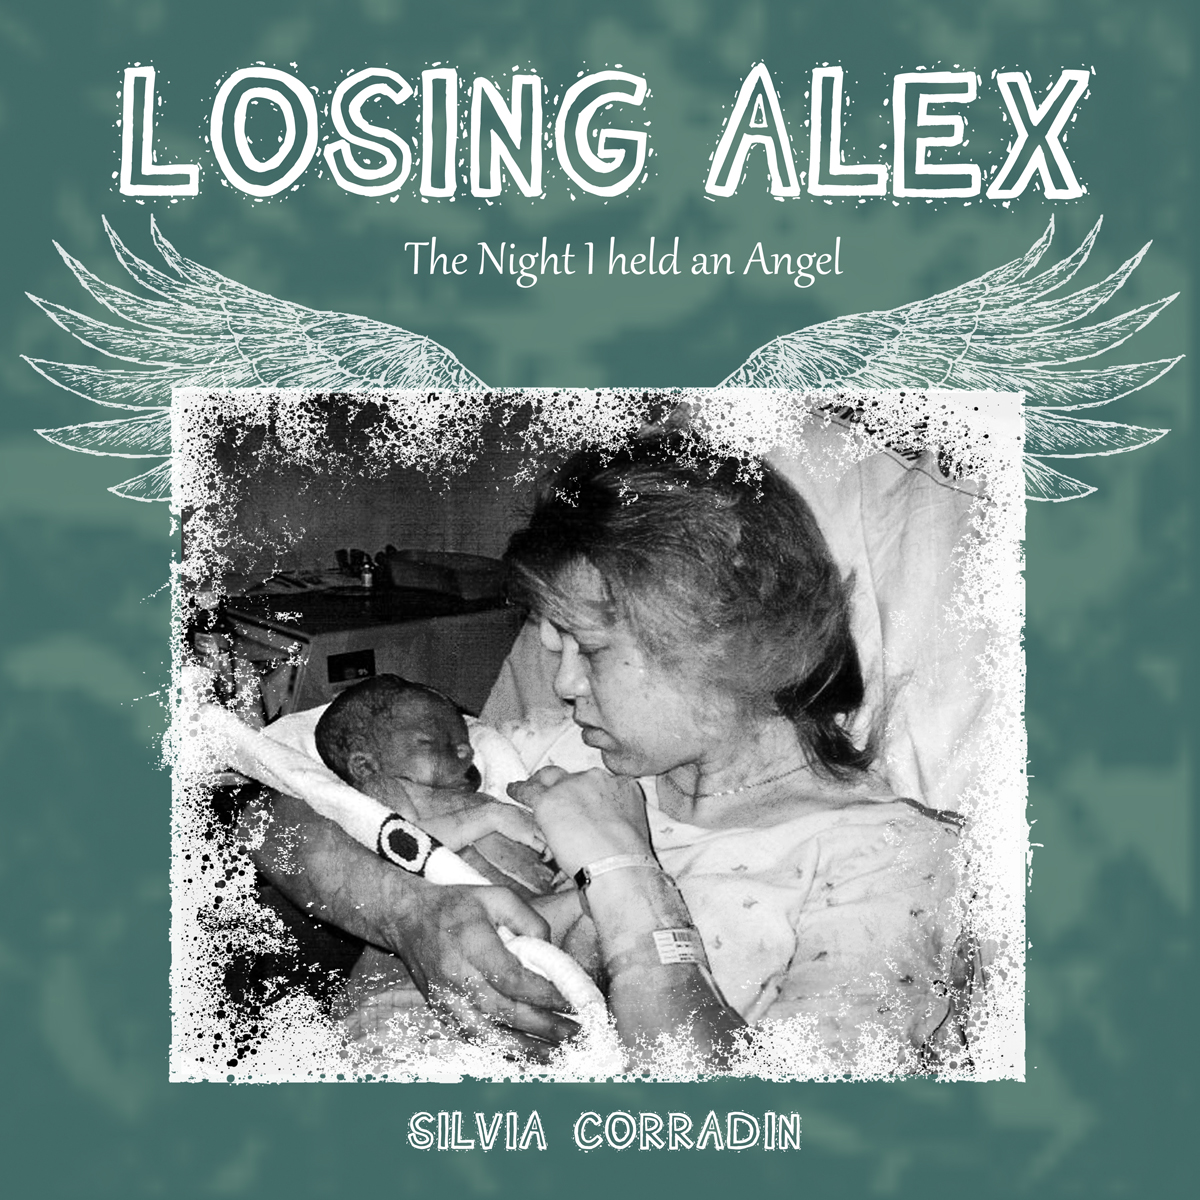 LosingAlexCover4s